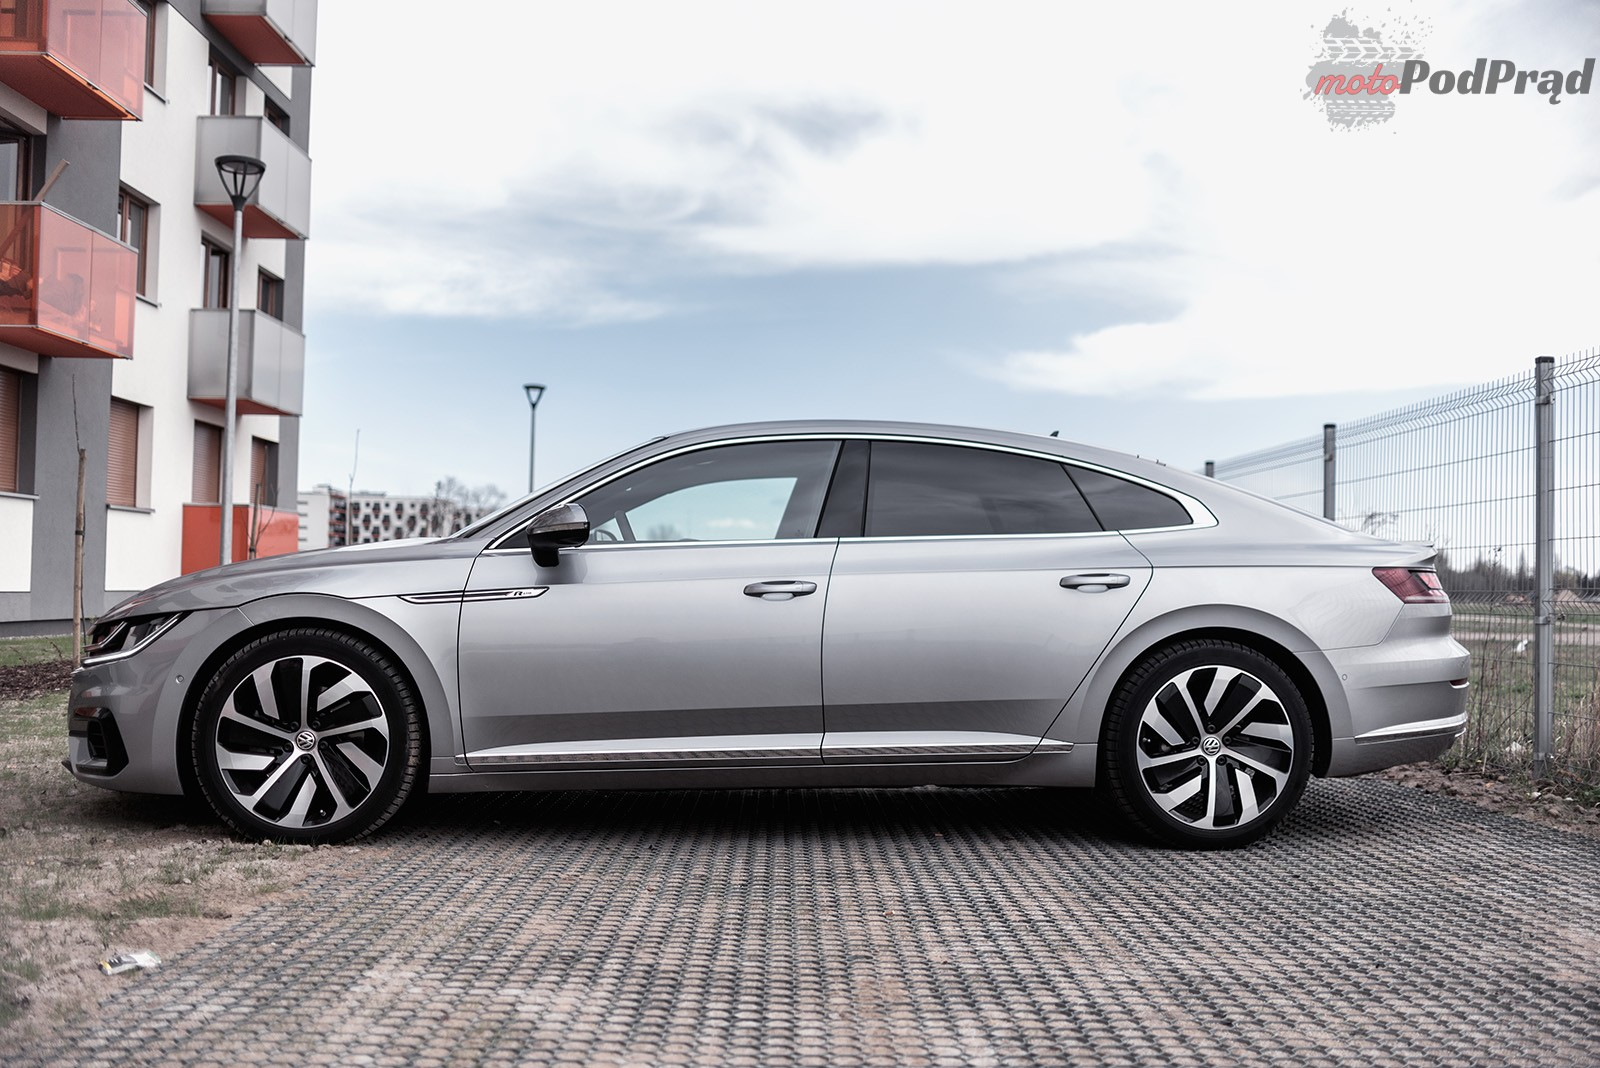 Volkswagen Arteon11 Test: Volkswagen Arteon 2.0 TSI 280 KM   udana metamorfoza